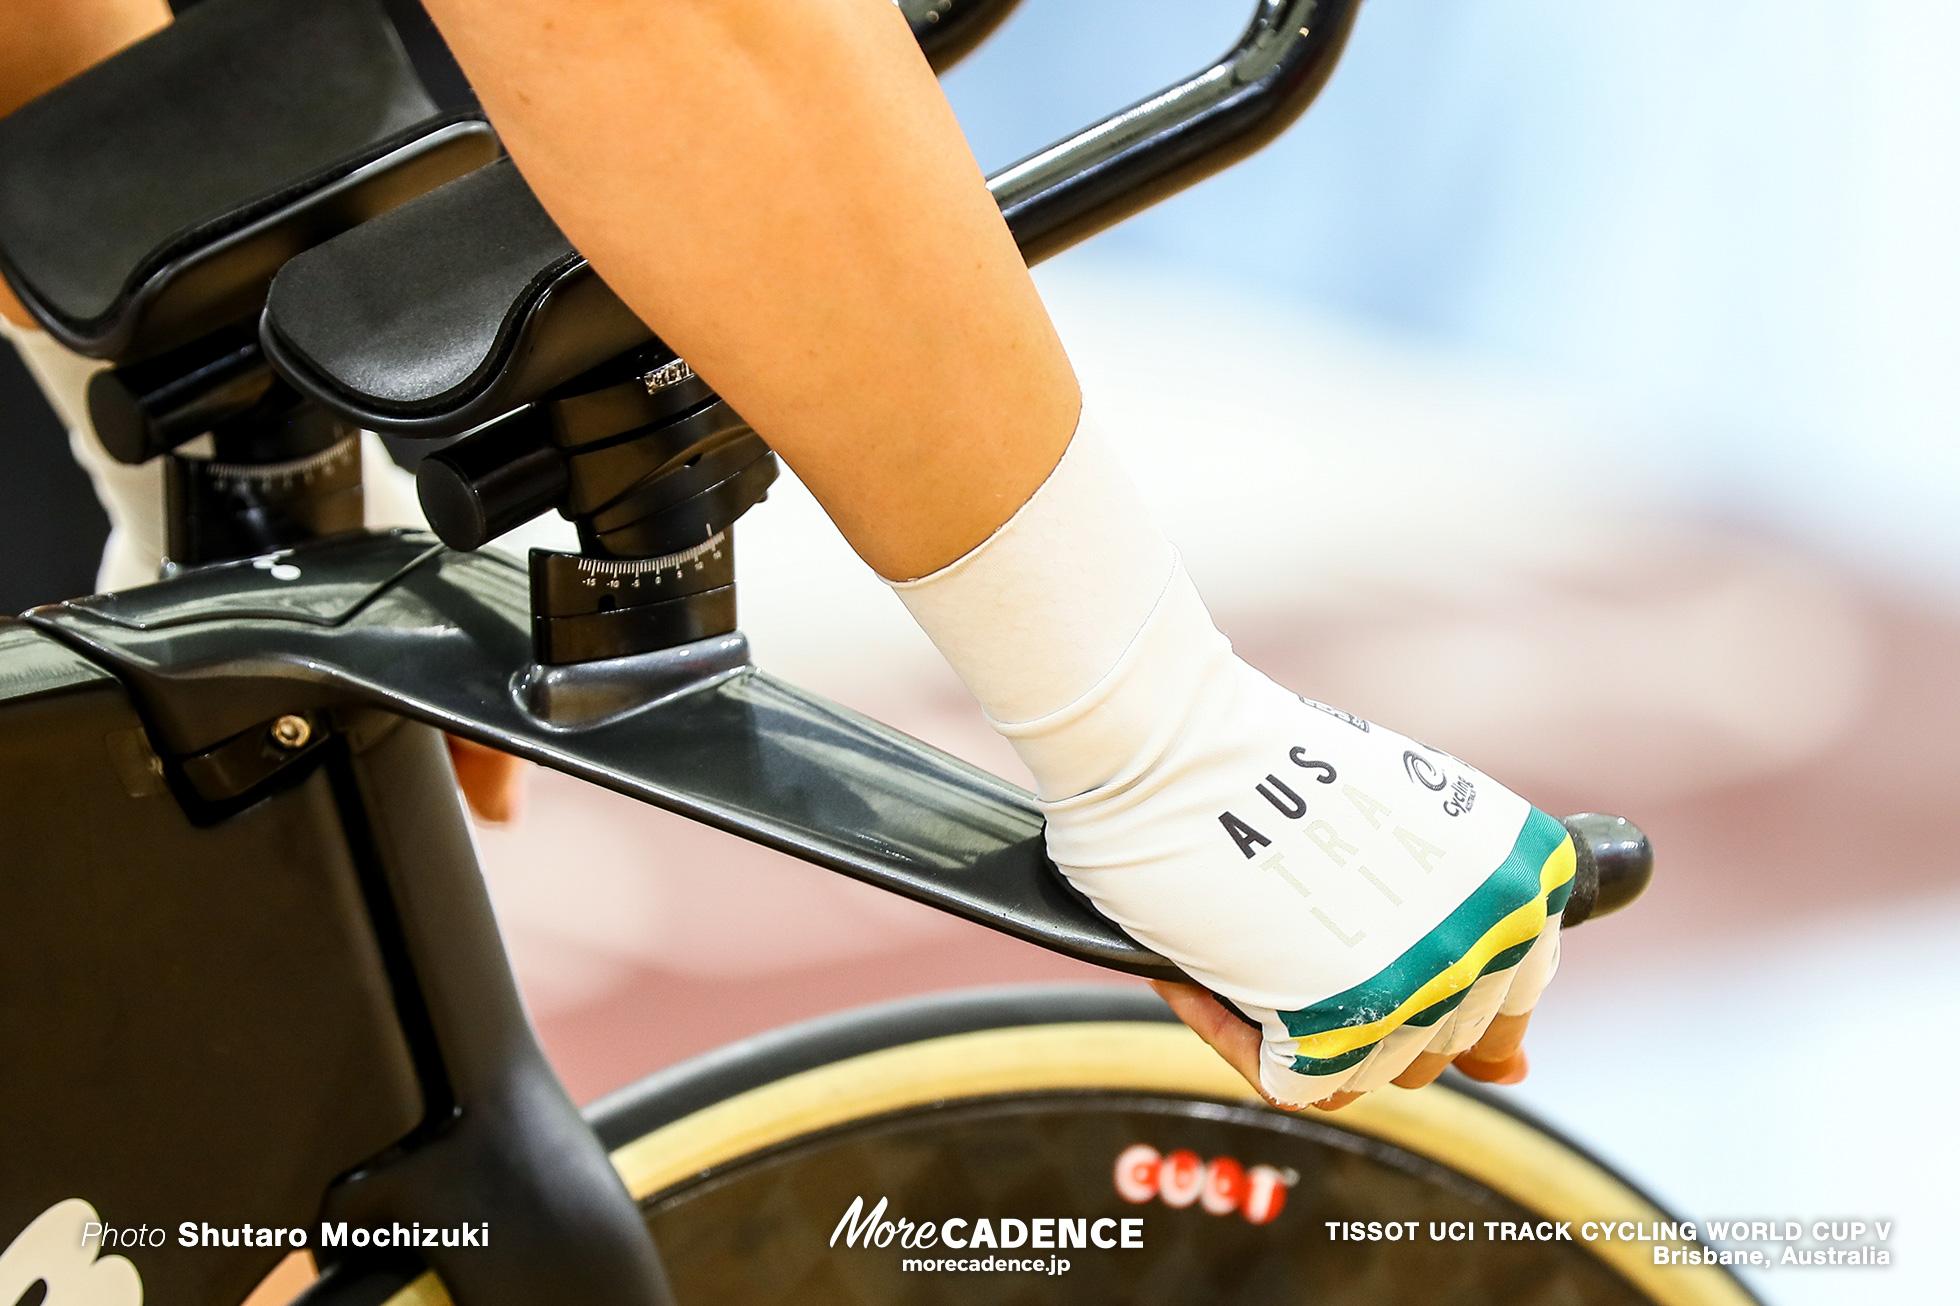 Qualifying / Women's Team Pursuit / TISSOT UCI TRACK CYCLING WORLD CUP V, Brisbane, Australia